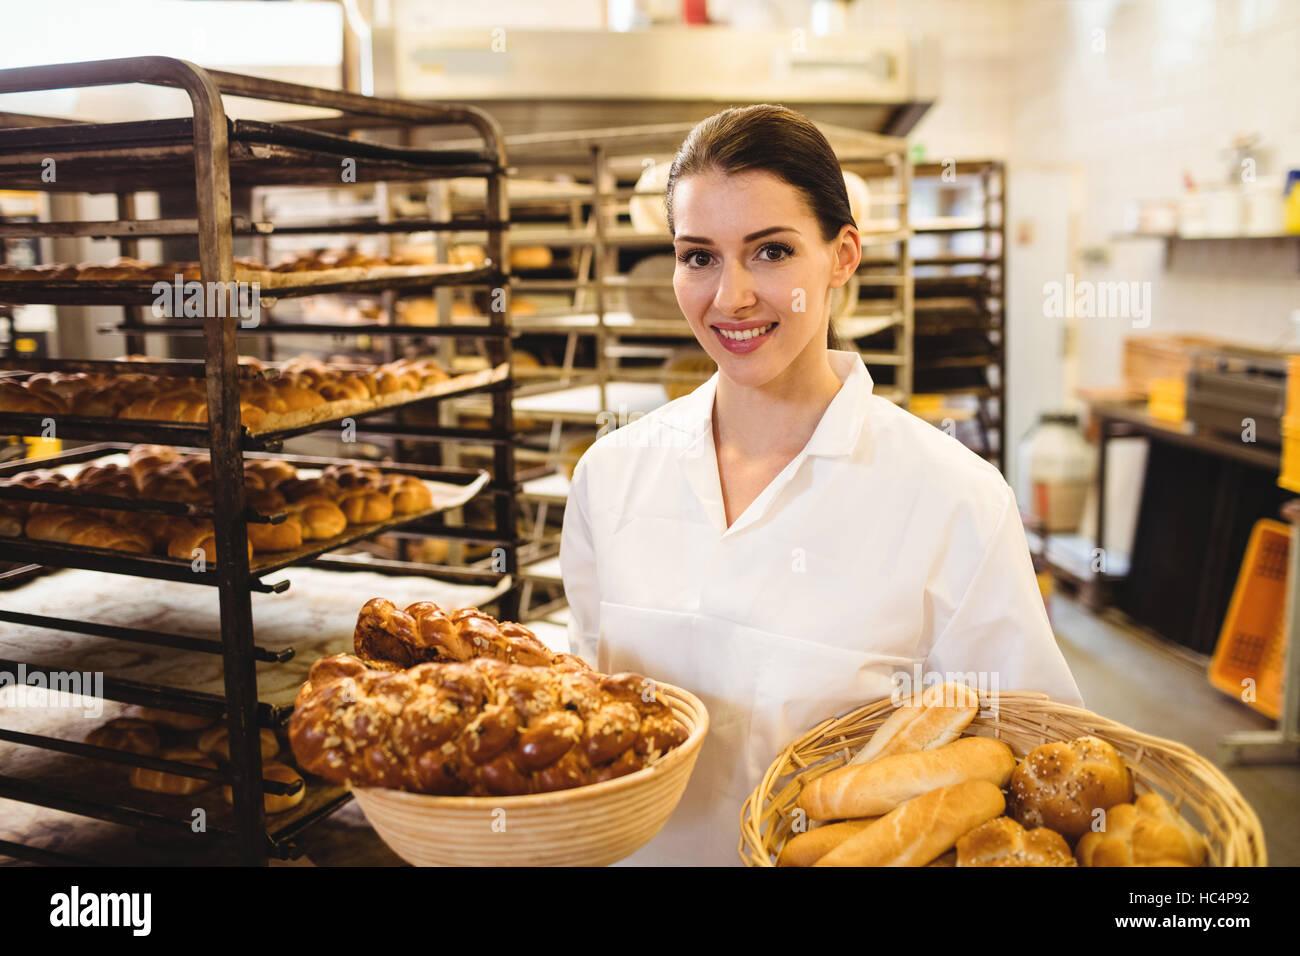 Female baker holding basket of sweet foods Stock Photo